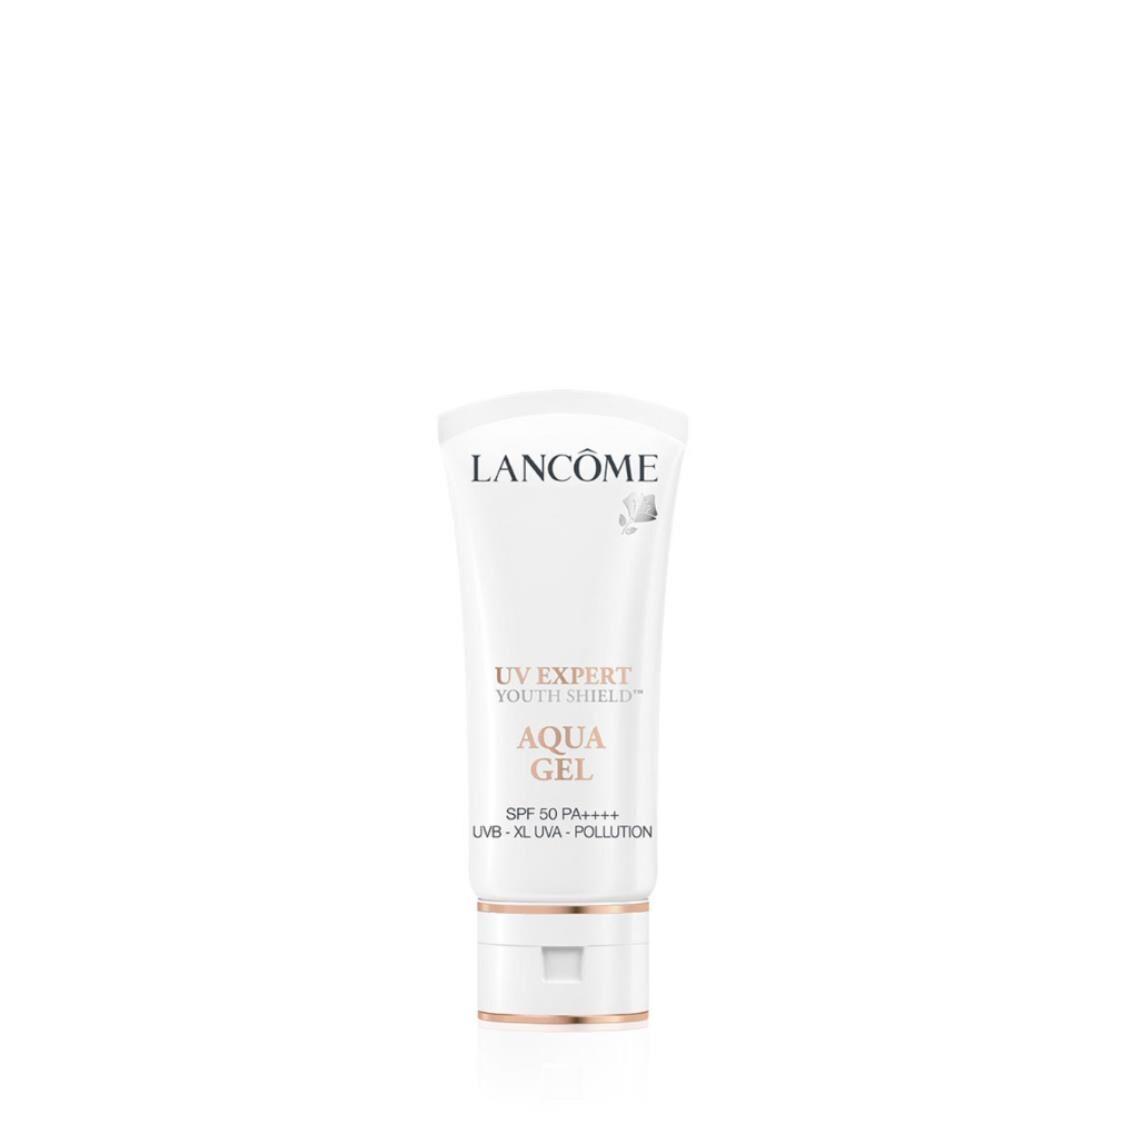 Lancome UV Expert Aqua Gel 30ml